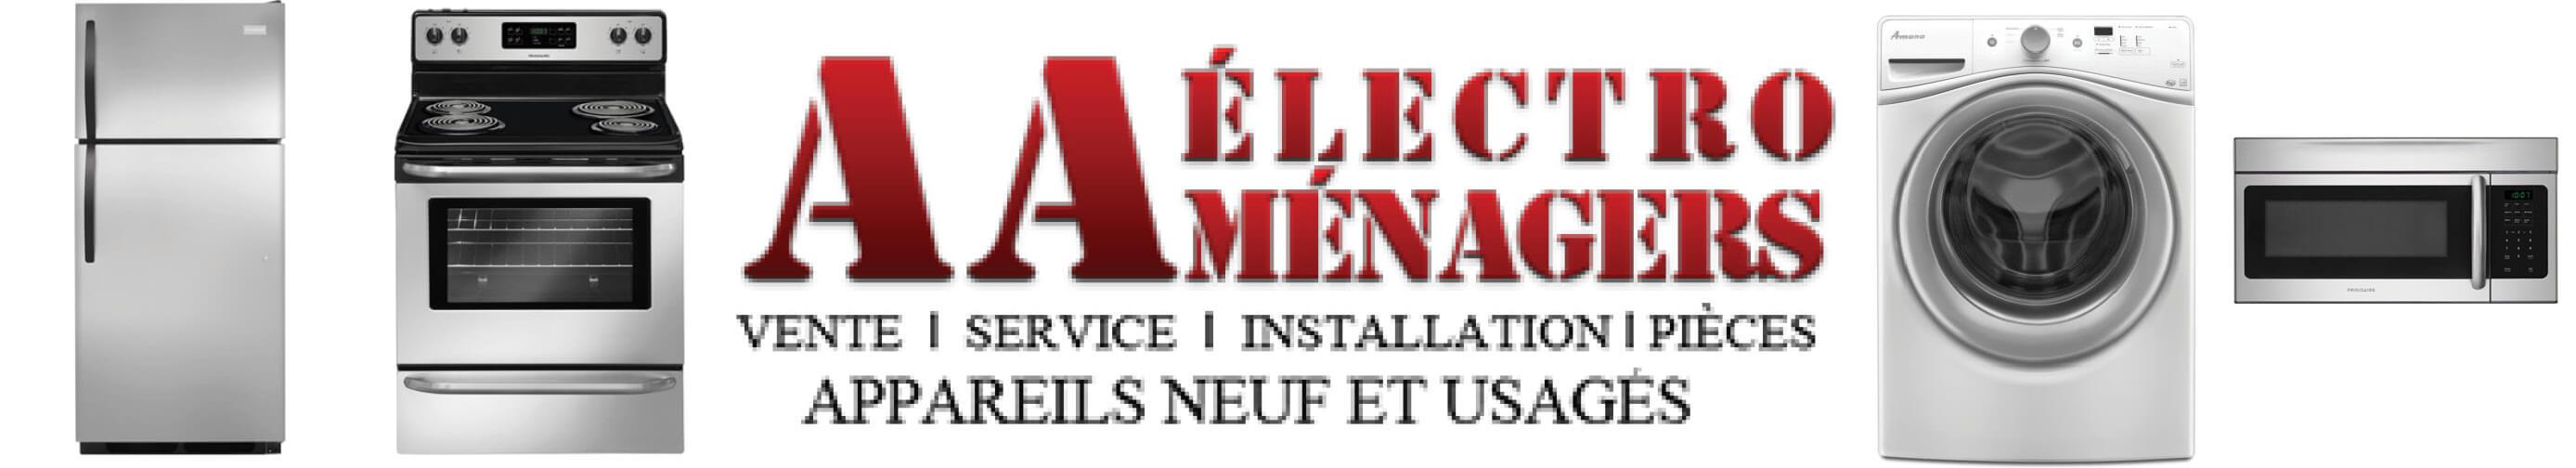 AA ELECTROMENAGERS